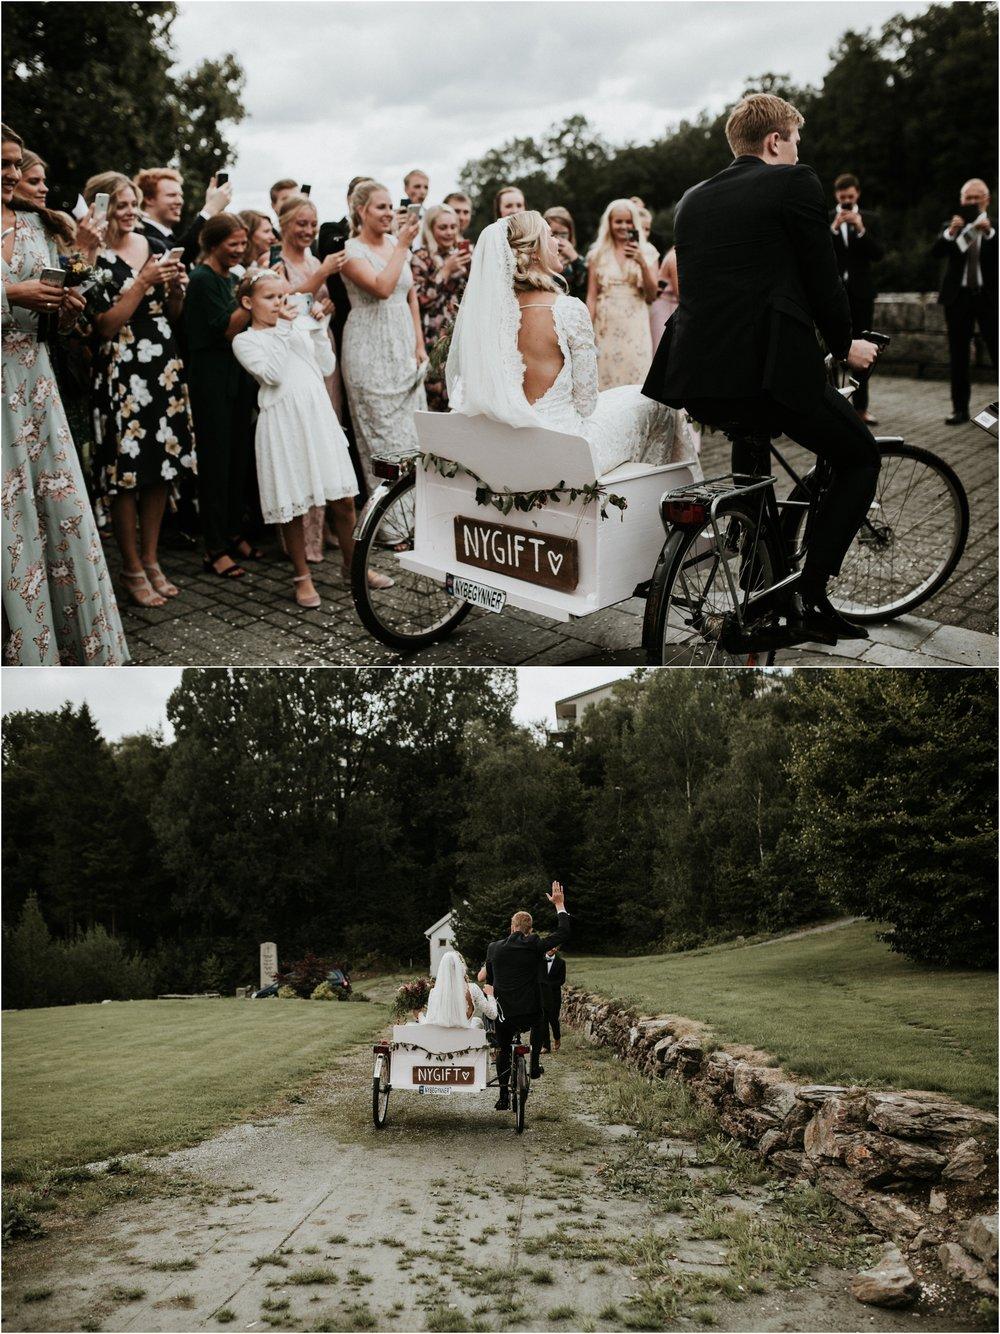 Norway-wedding-photographer-121.jpg